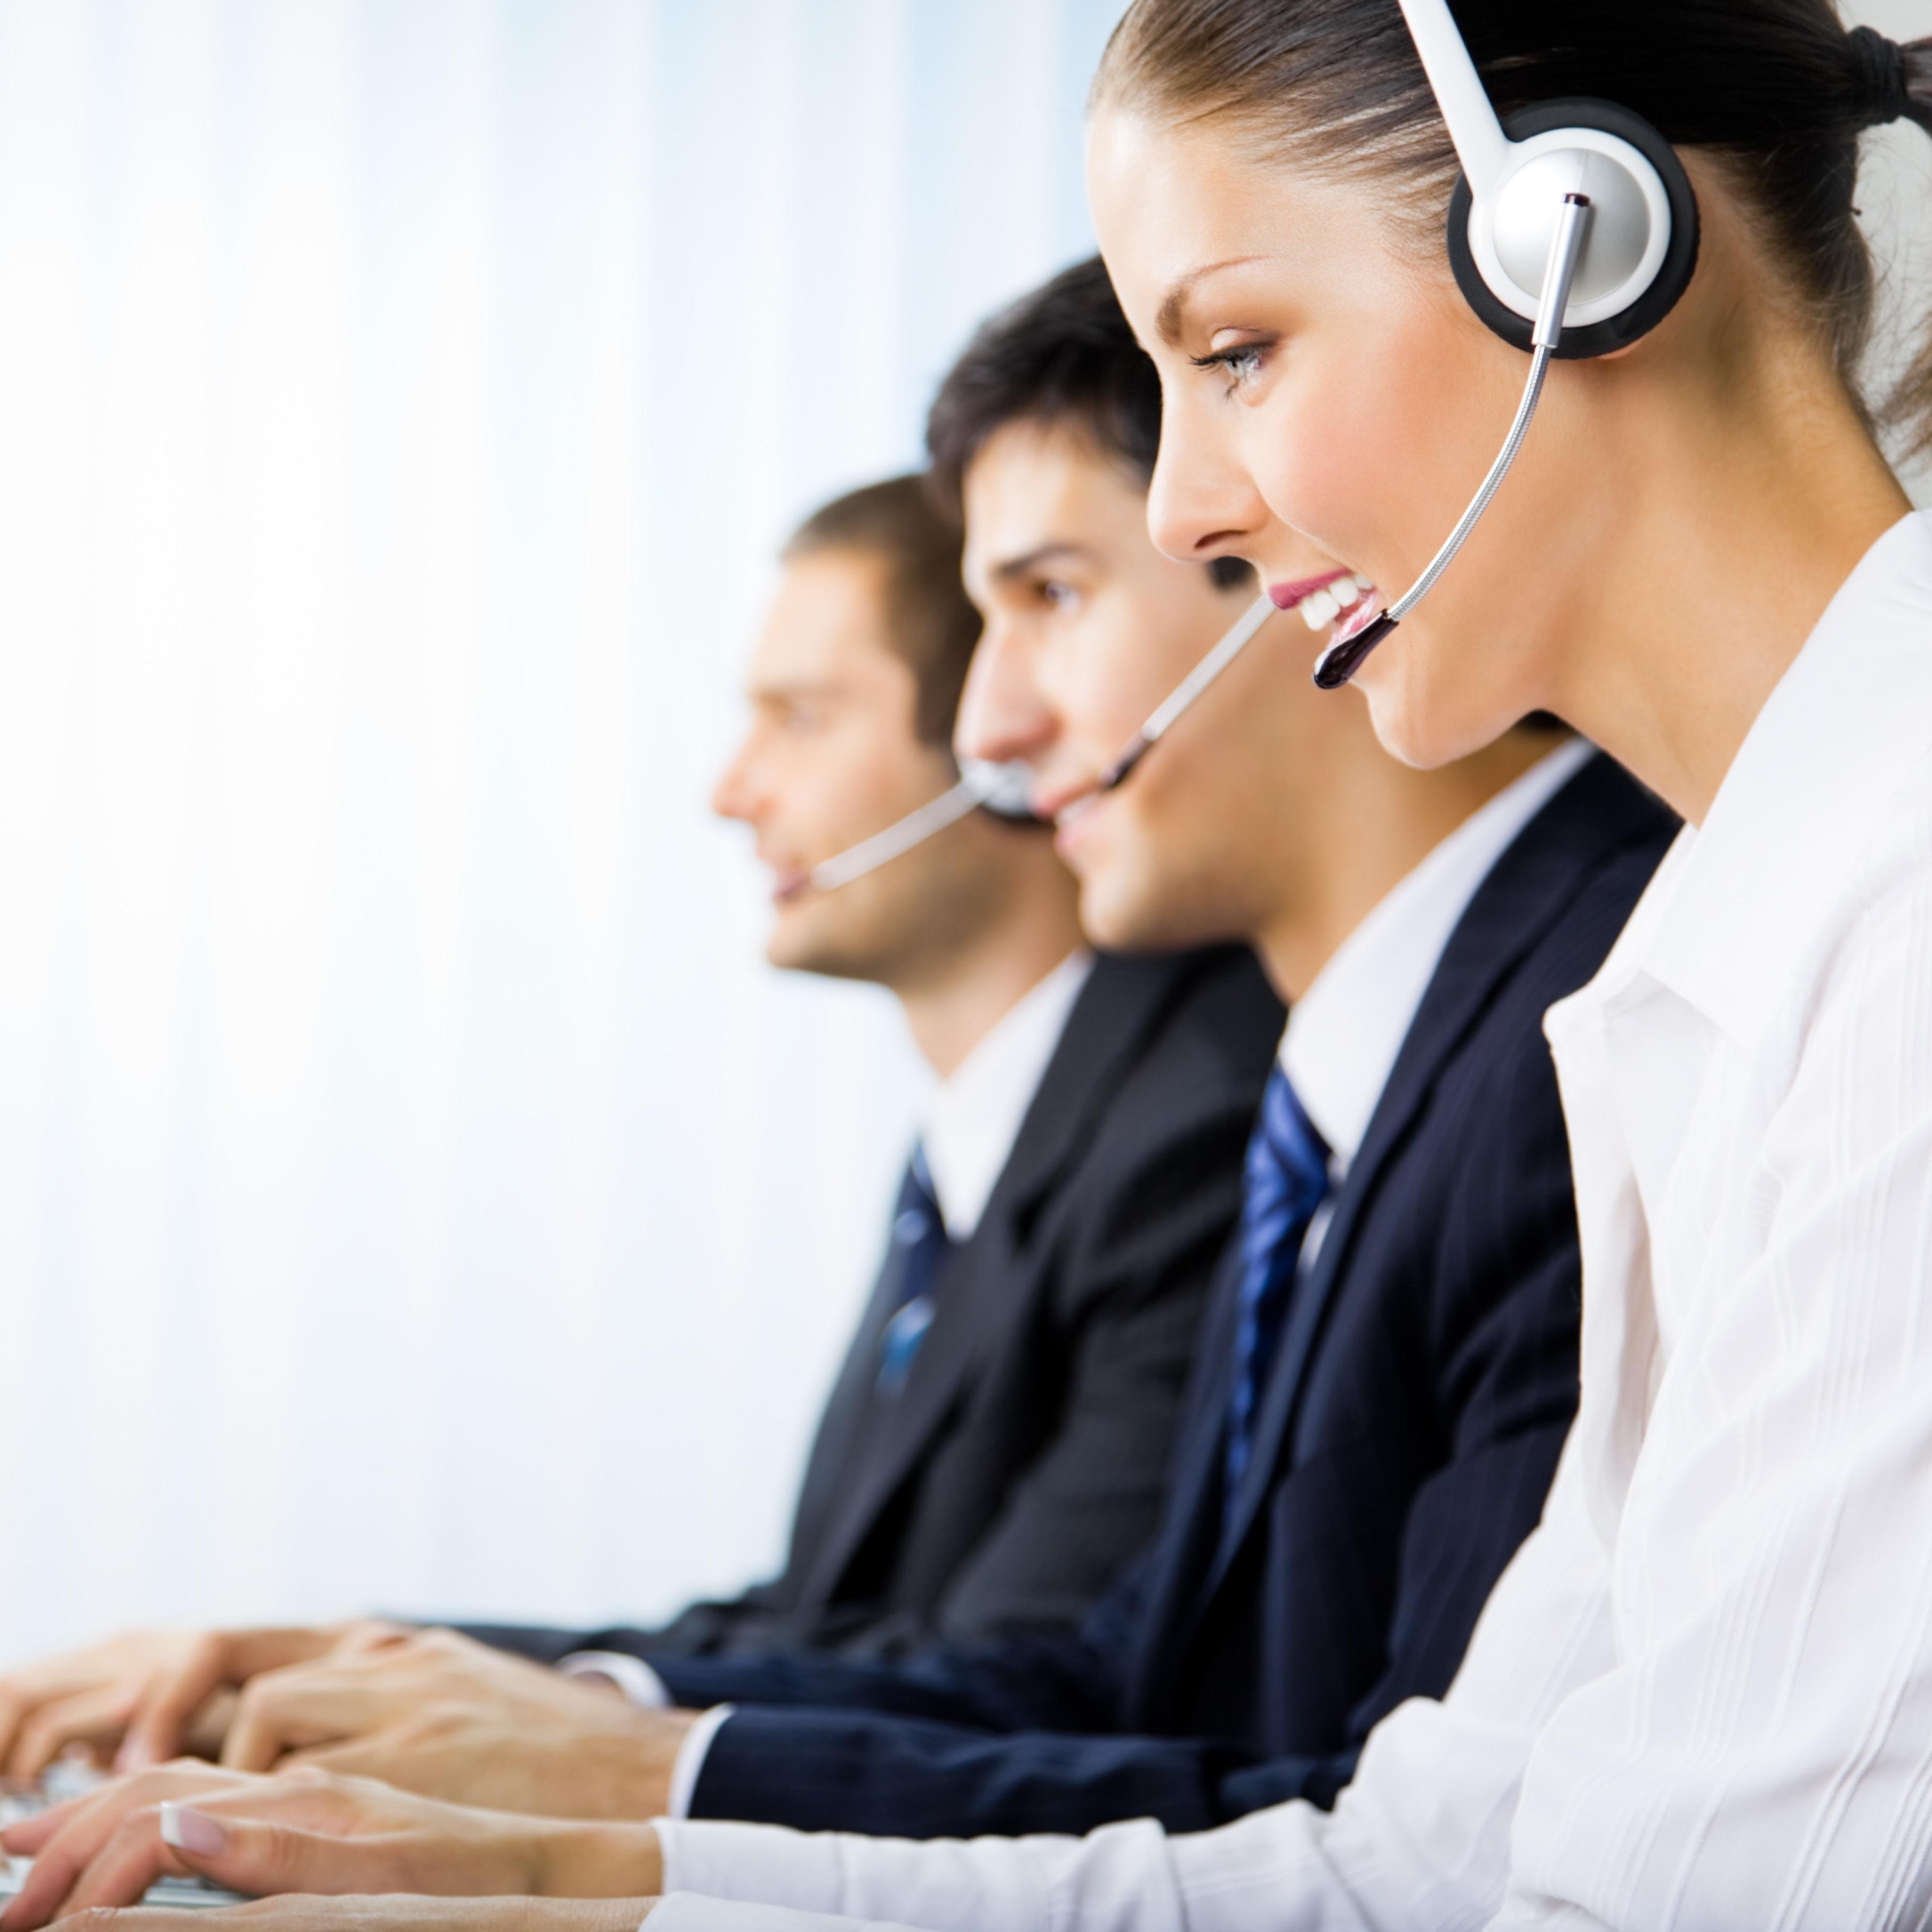 Customer Service in English